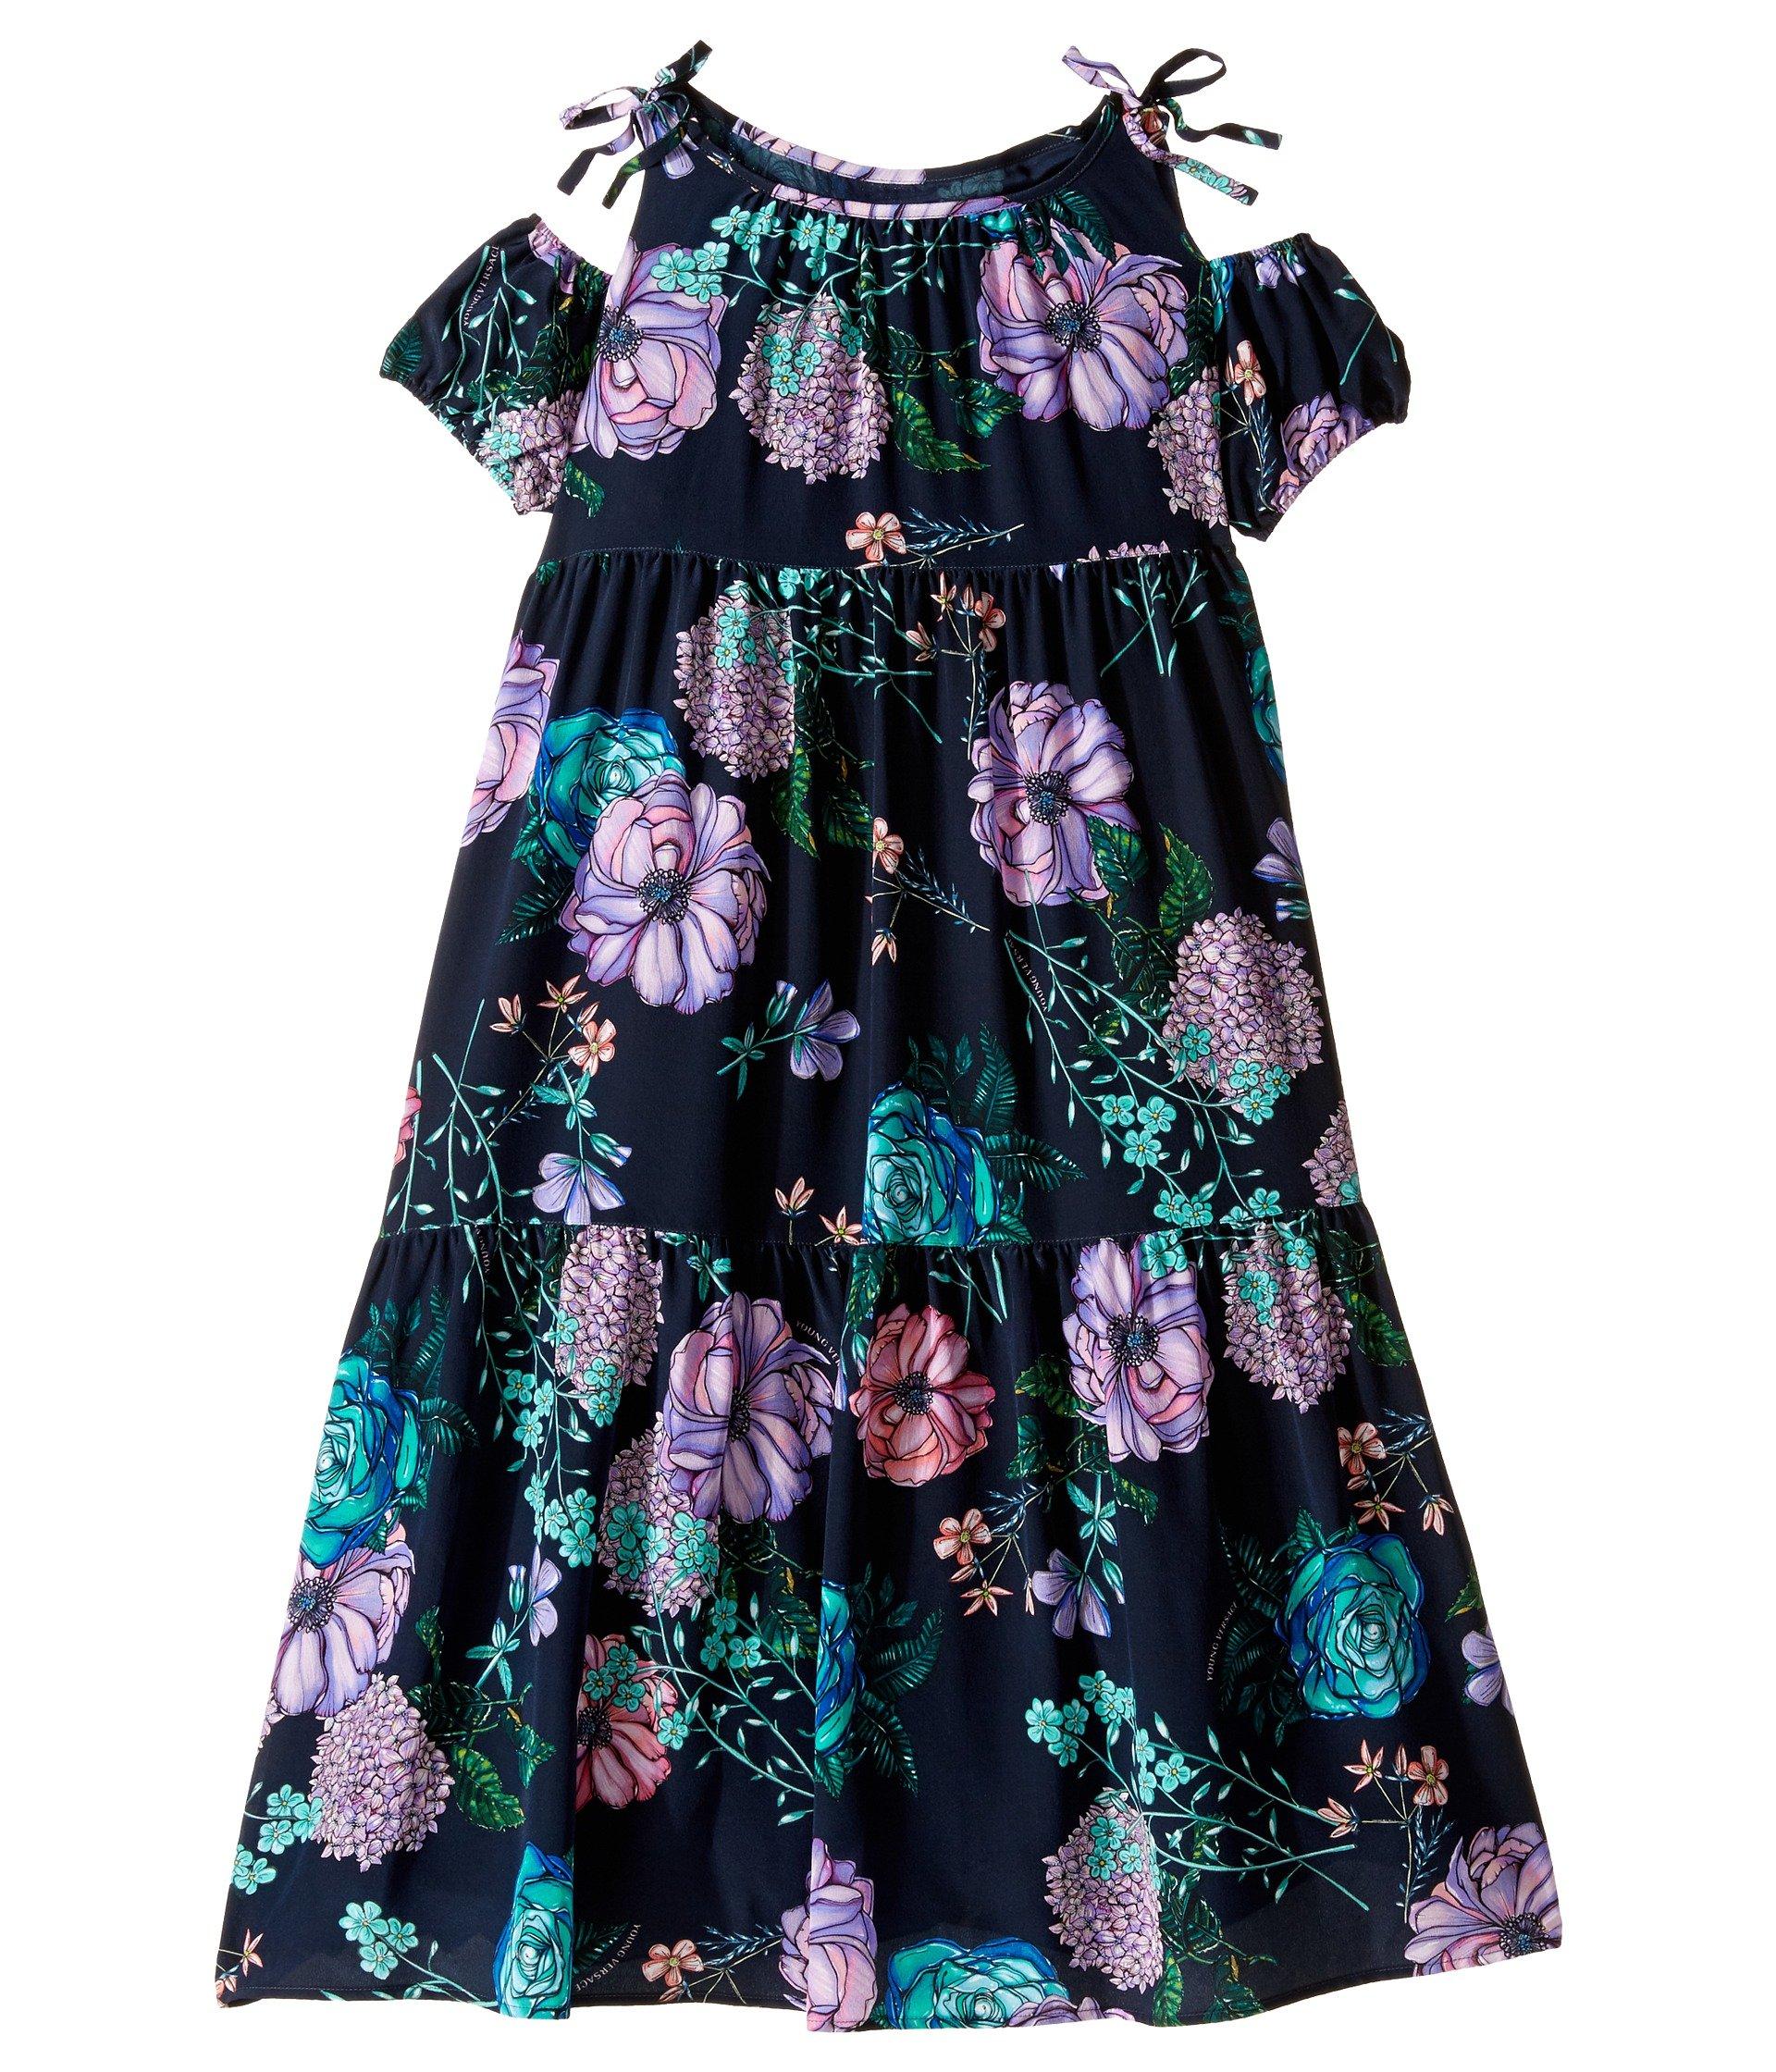 Vestido para Niña Versace Kids Floral Print Maxi Dress w/ Shoulder Cut Outs (Big Kids)  + Versace en VeoyCompro.net